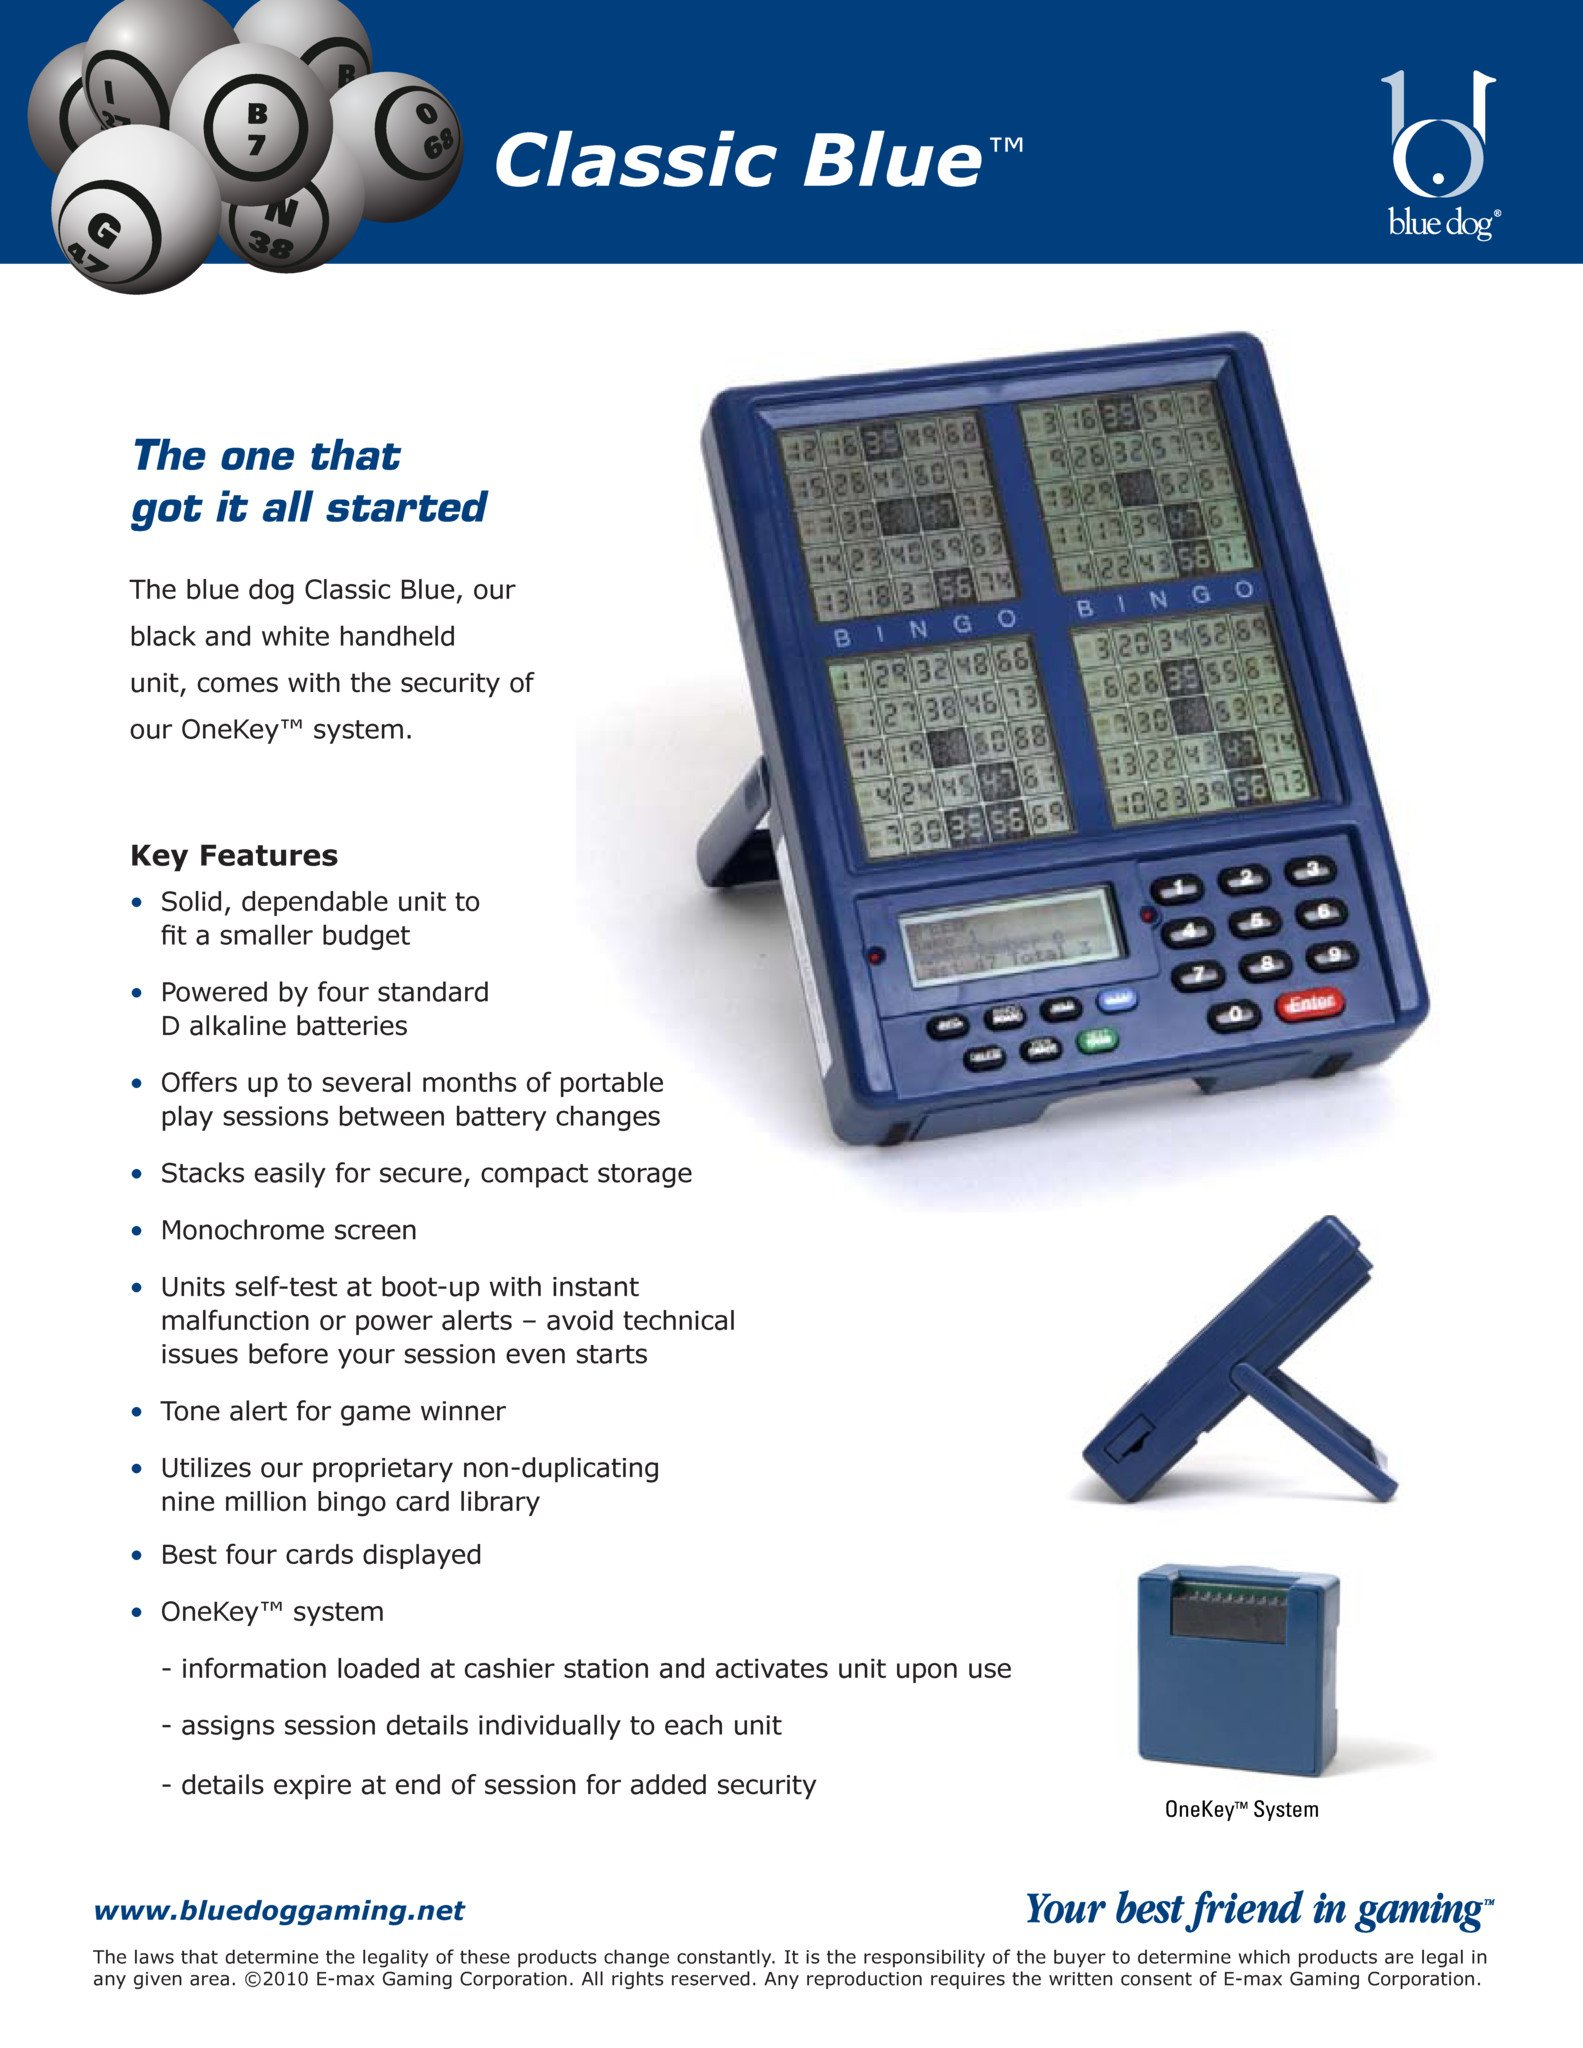 Classic Blue Brochure Promotional Materials/Equipment Flyers & Brochures